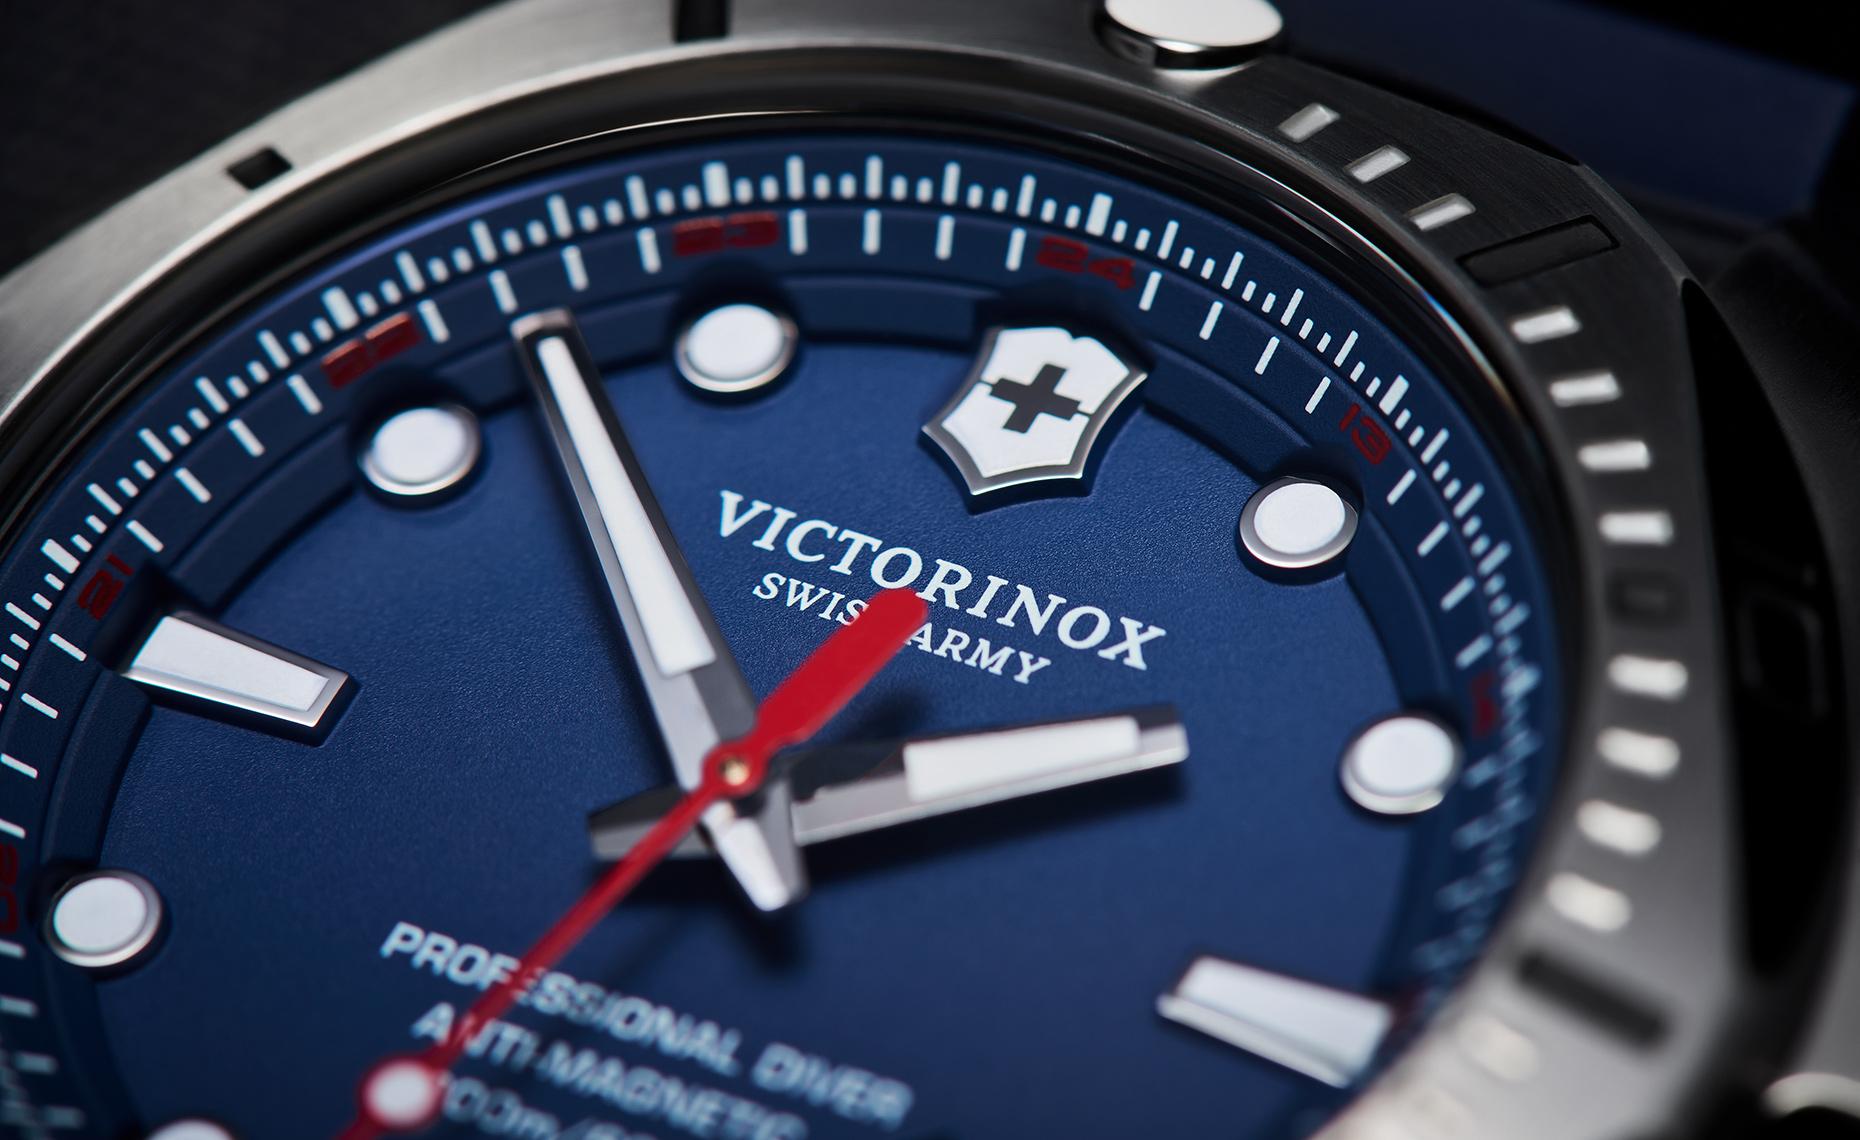 tom-medvedich-still-life-jewelry-watches-victorinox-inox-navy-macro.jpg